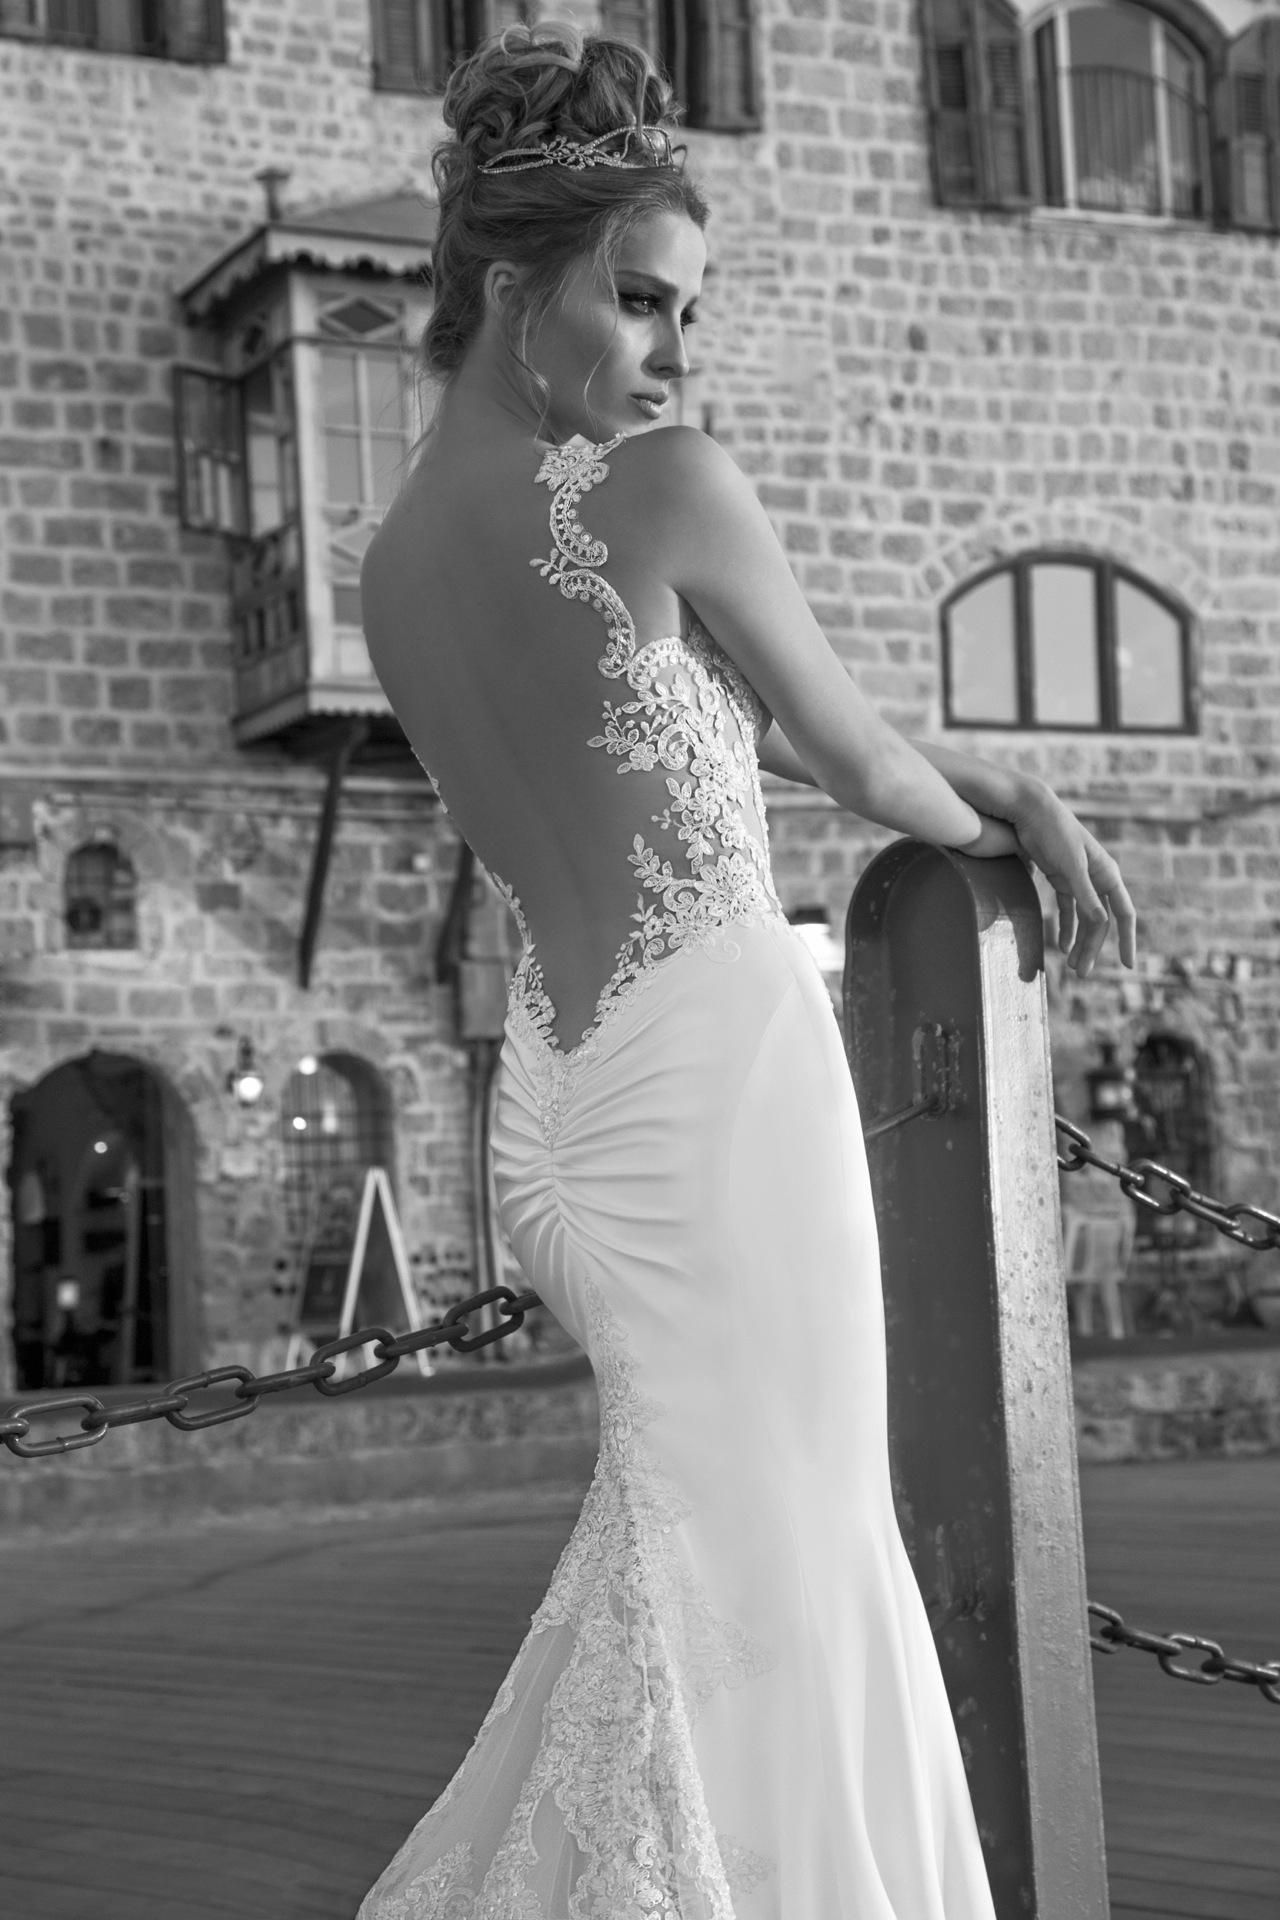 Lace wedding dress open back mermaid  Wholesale LN Perfect Looking MermaidTrumpet Wedding Dresses Open